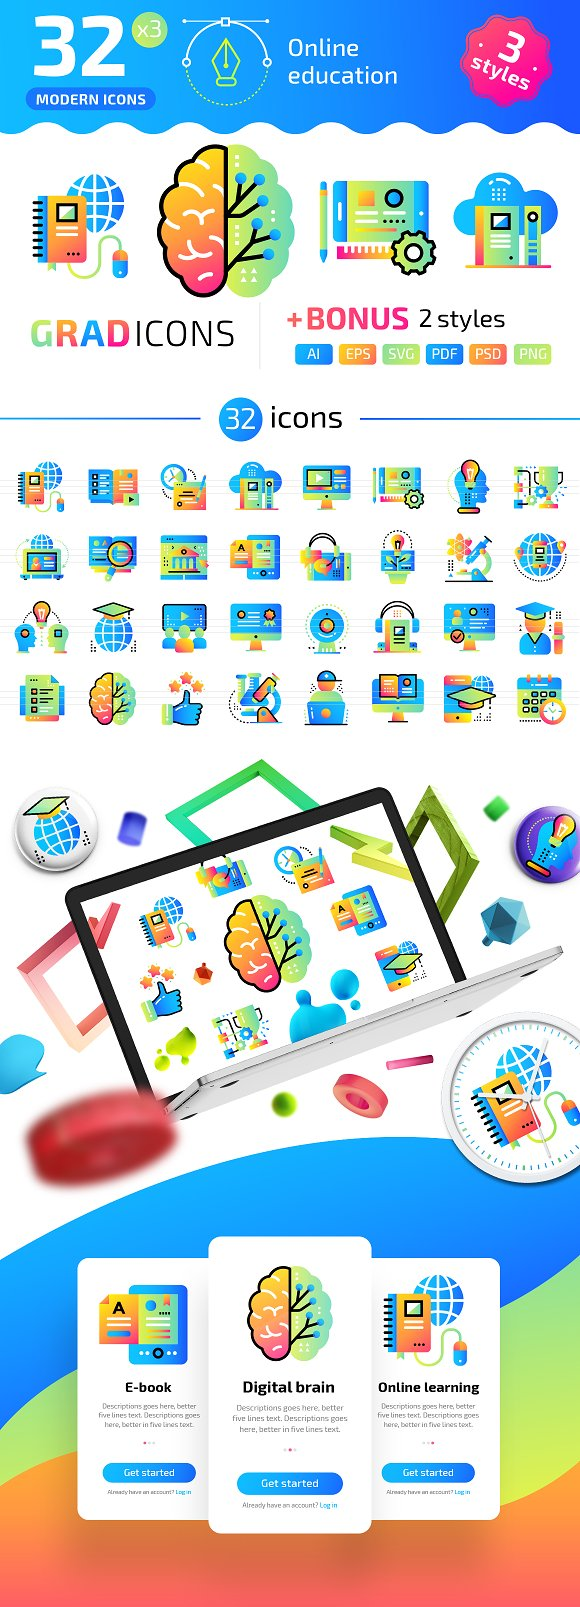 32 Online Education GRADICONS